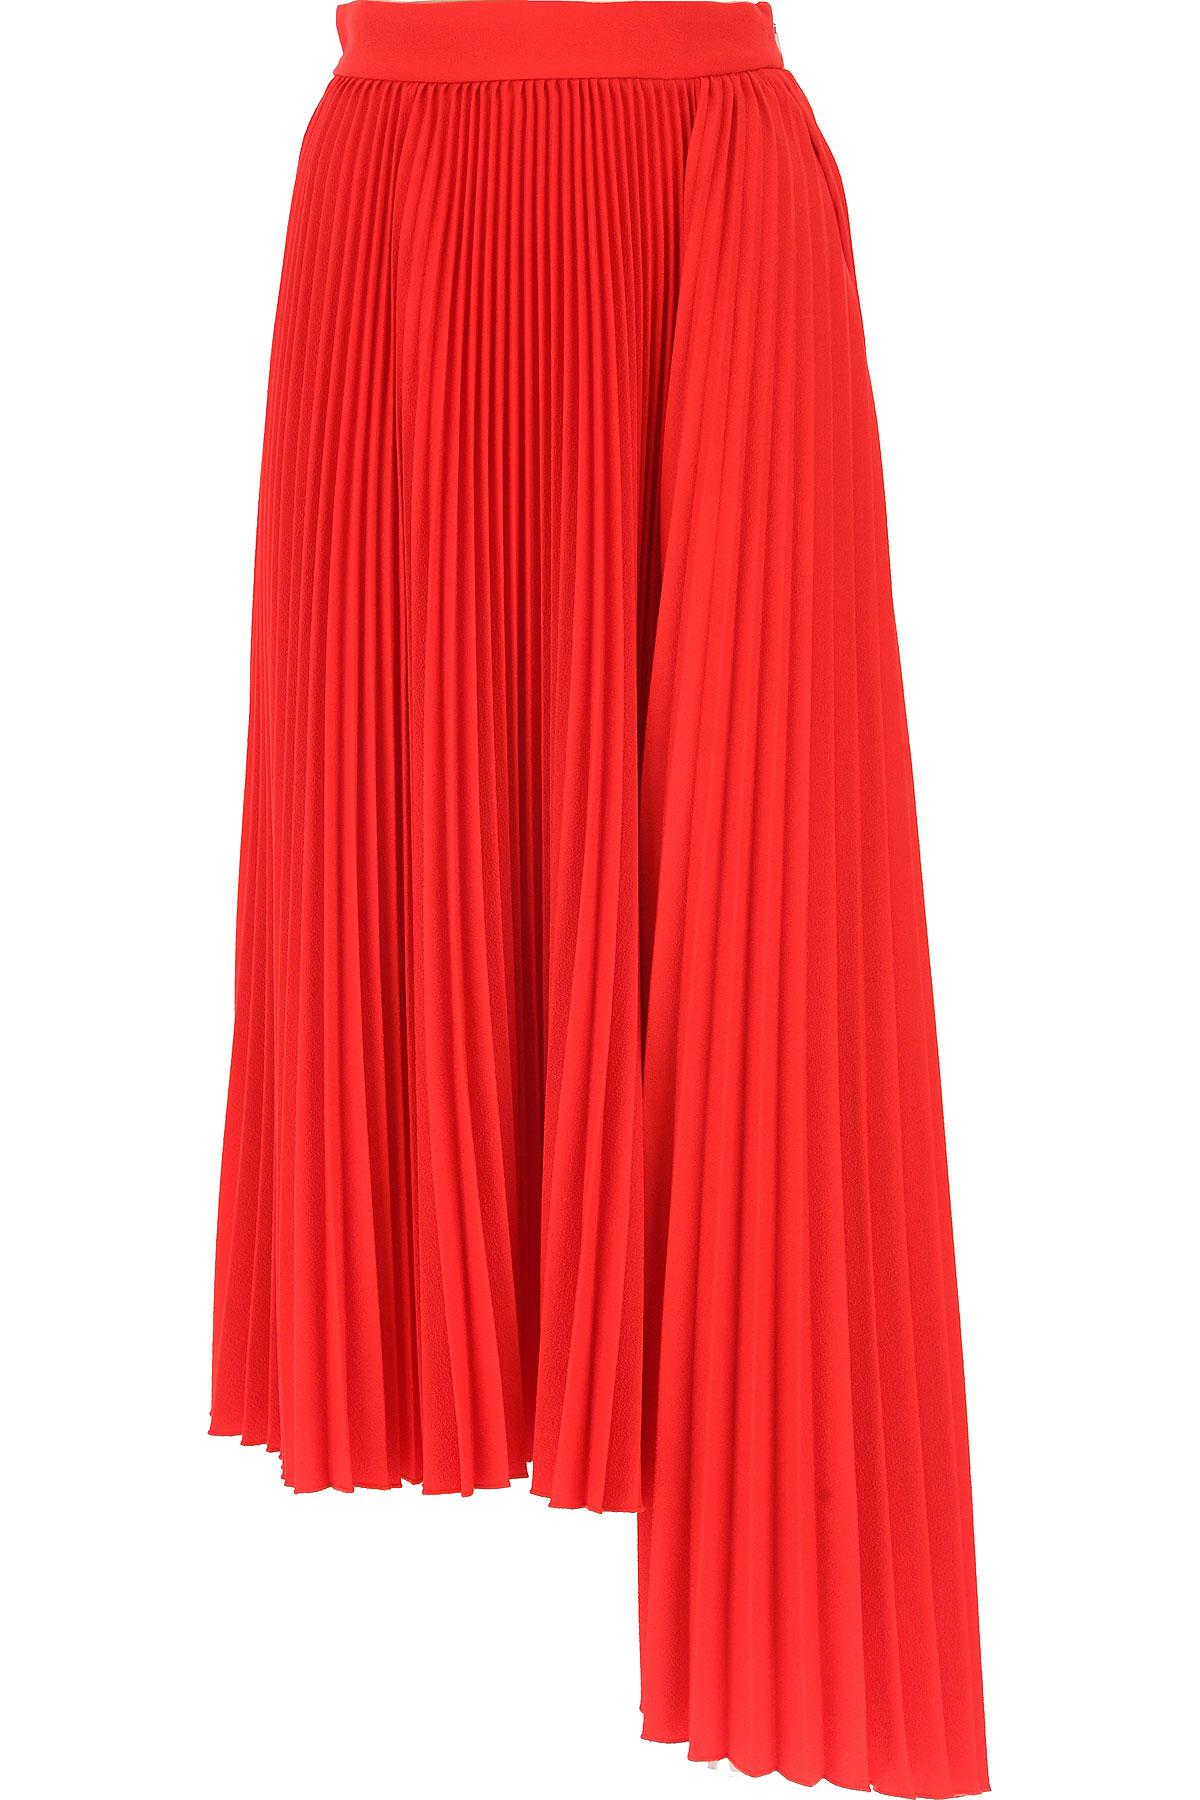 MSGM Skirt for Women, Red, polyestere, 2017, 26 28